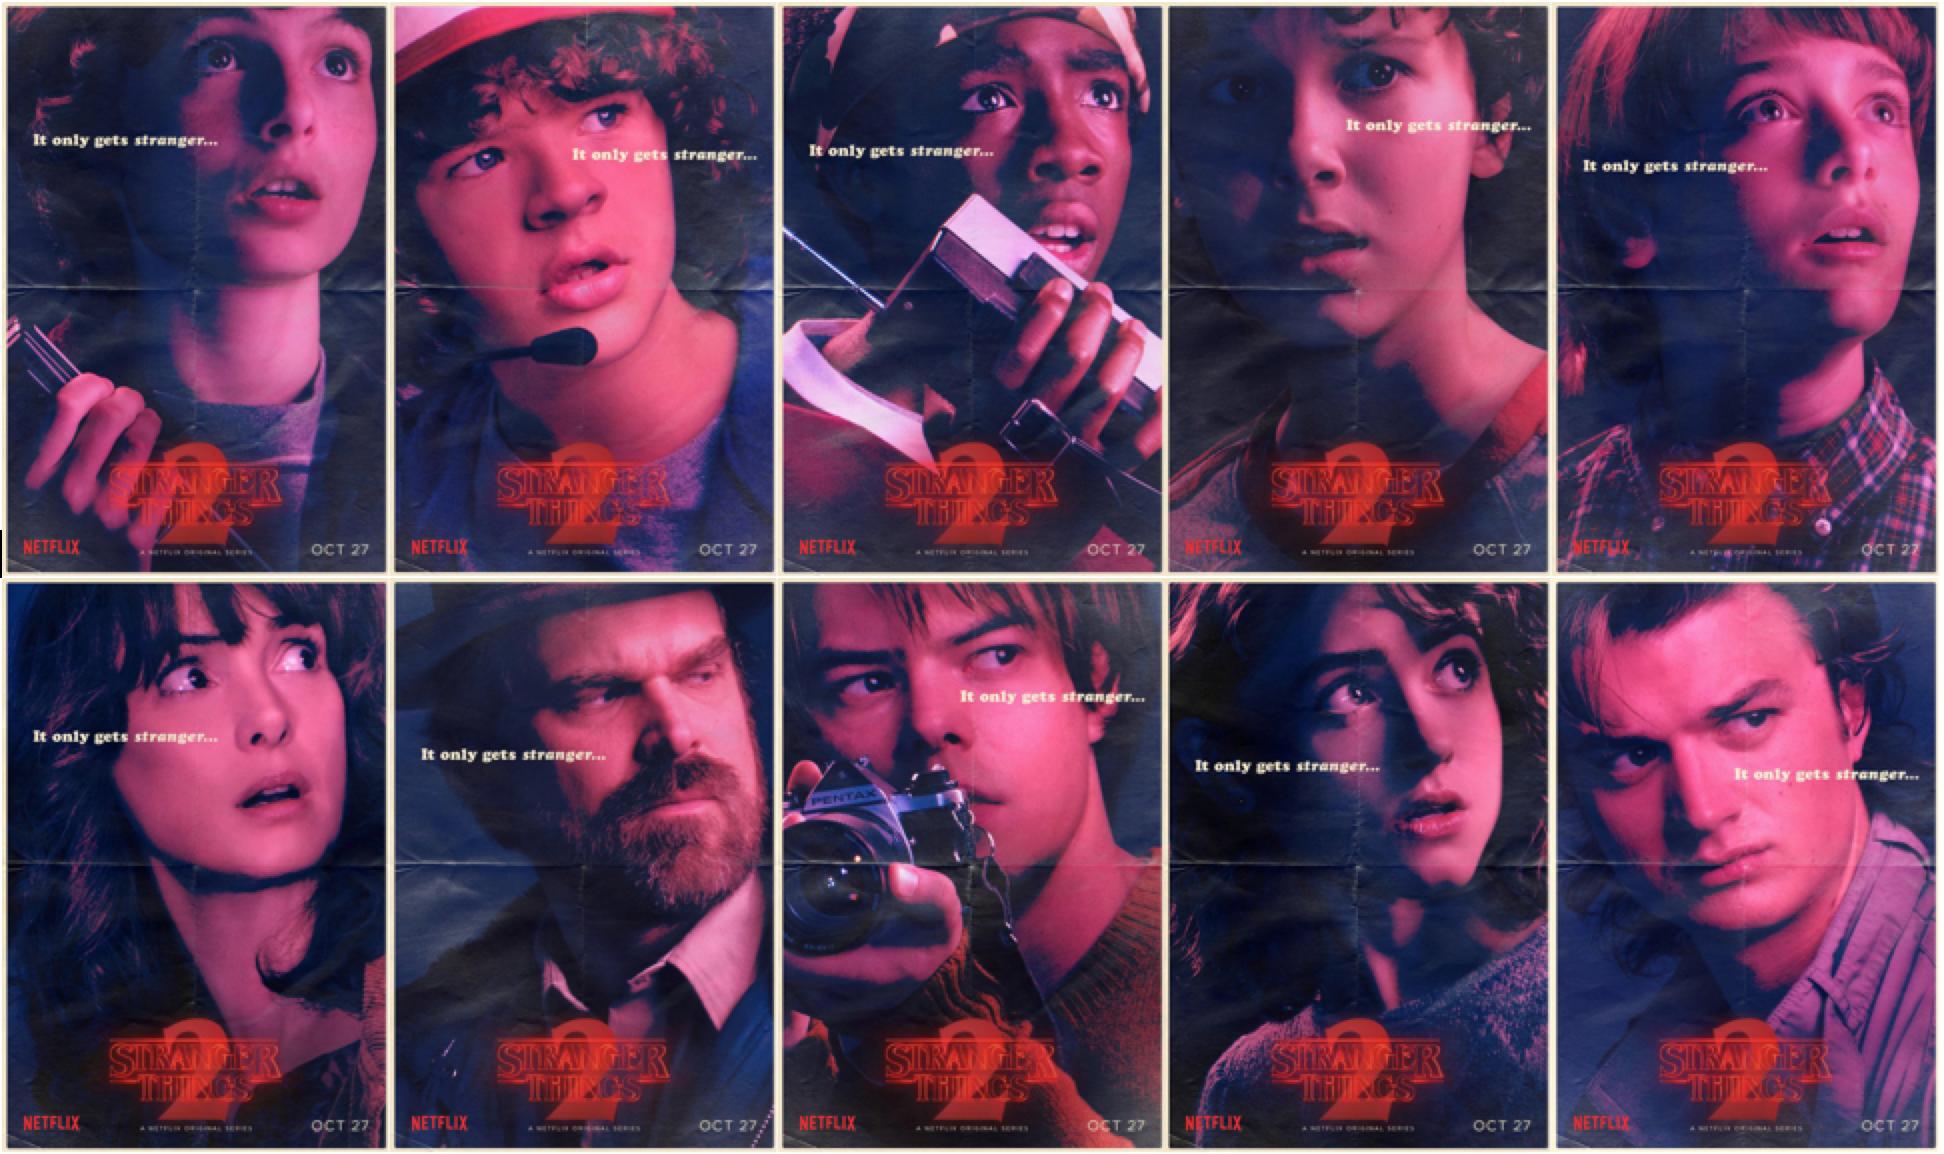 Stranger Things' Season 2 Character Posters: Returning Cast